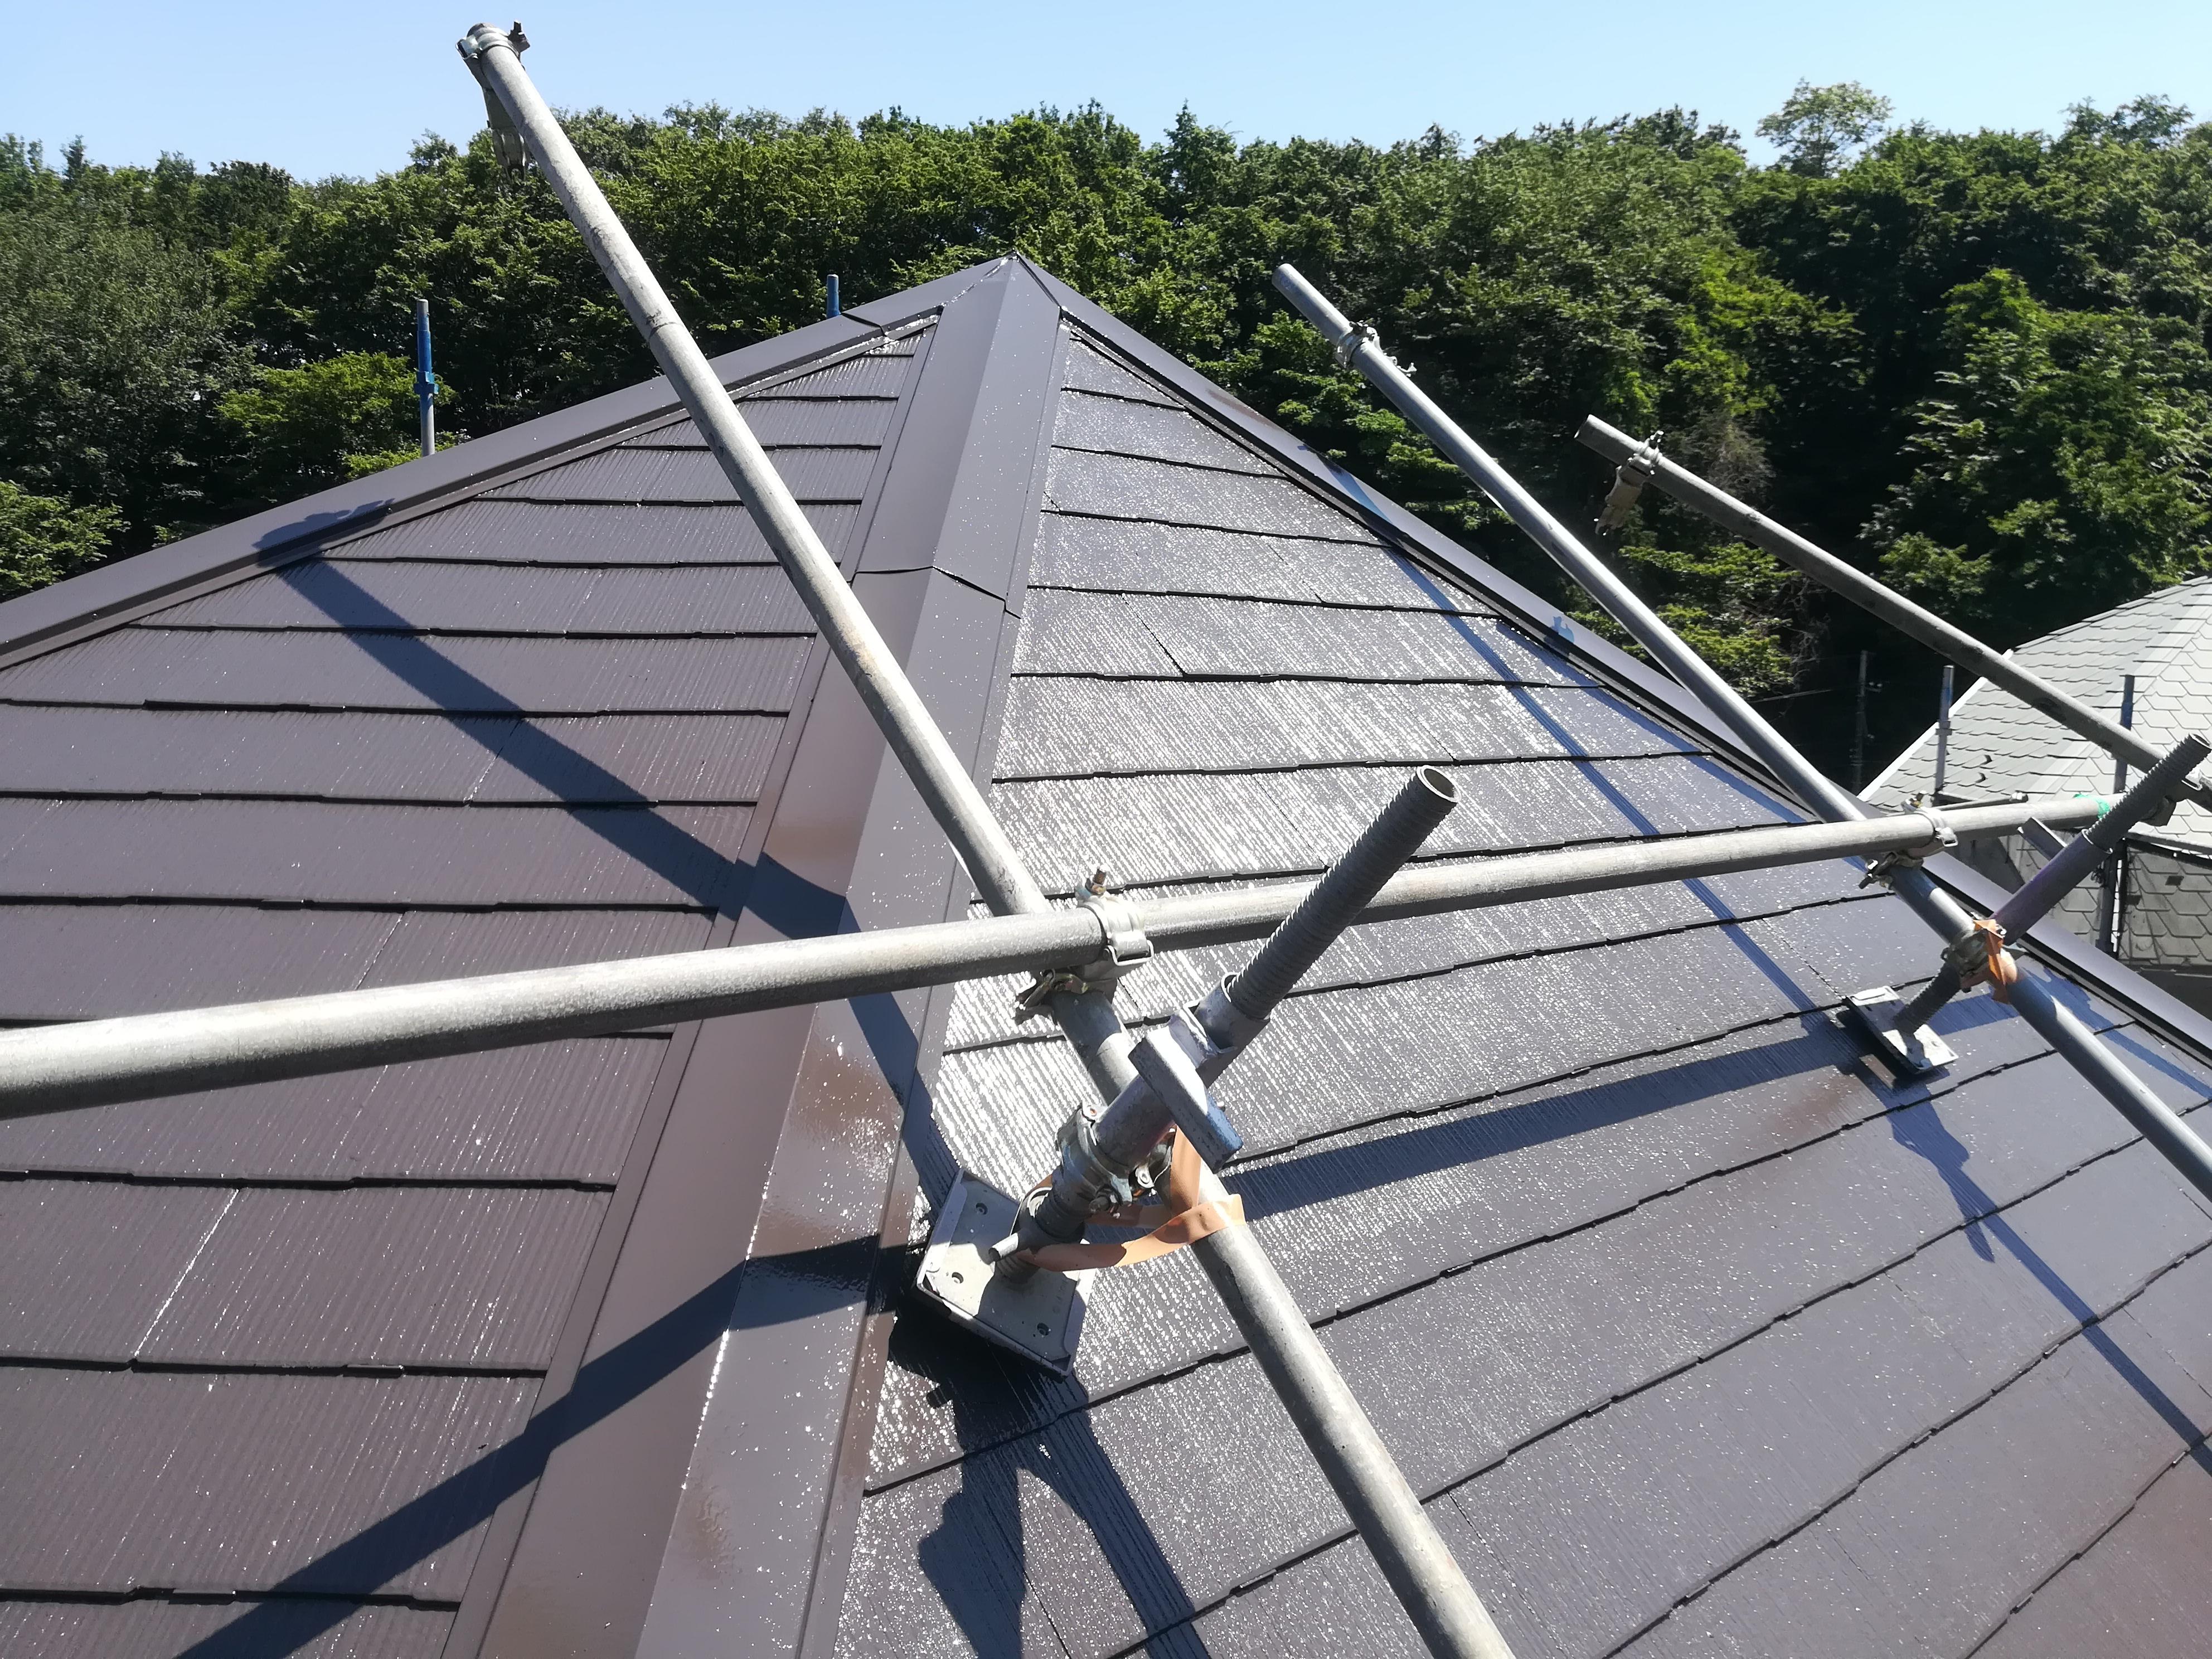 横浜市港北区小机町にて急勾配屋根に屋根足場を組んでの棟板金交換、屋根塗装工事